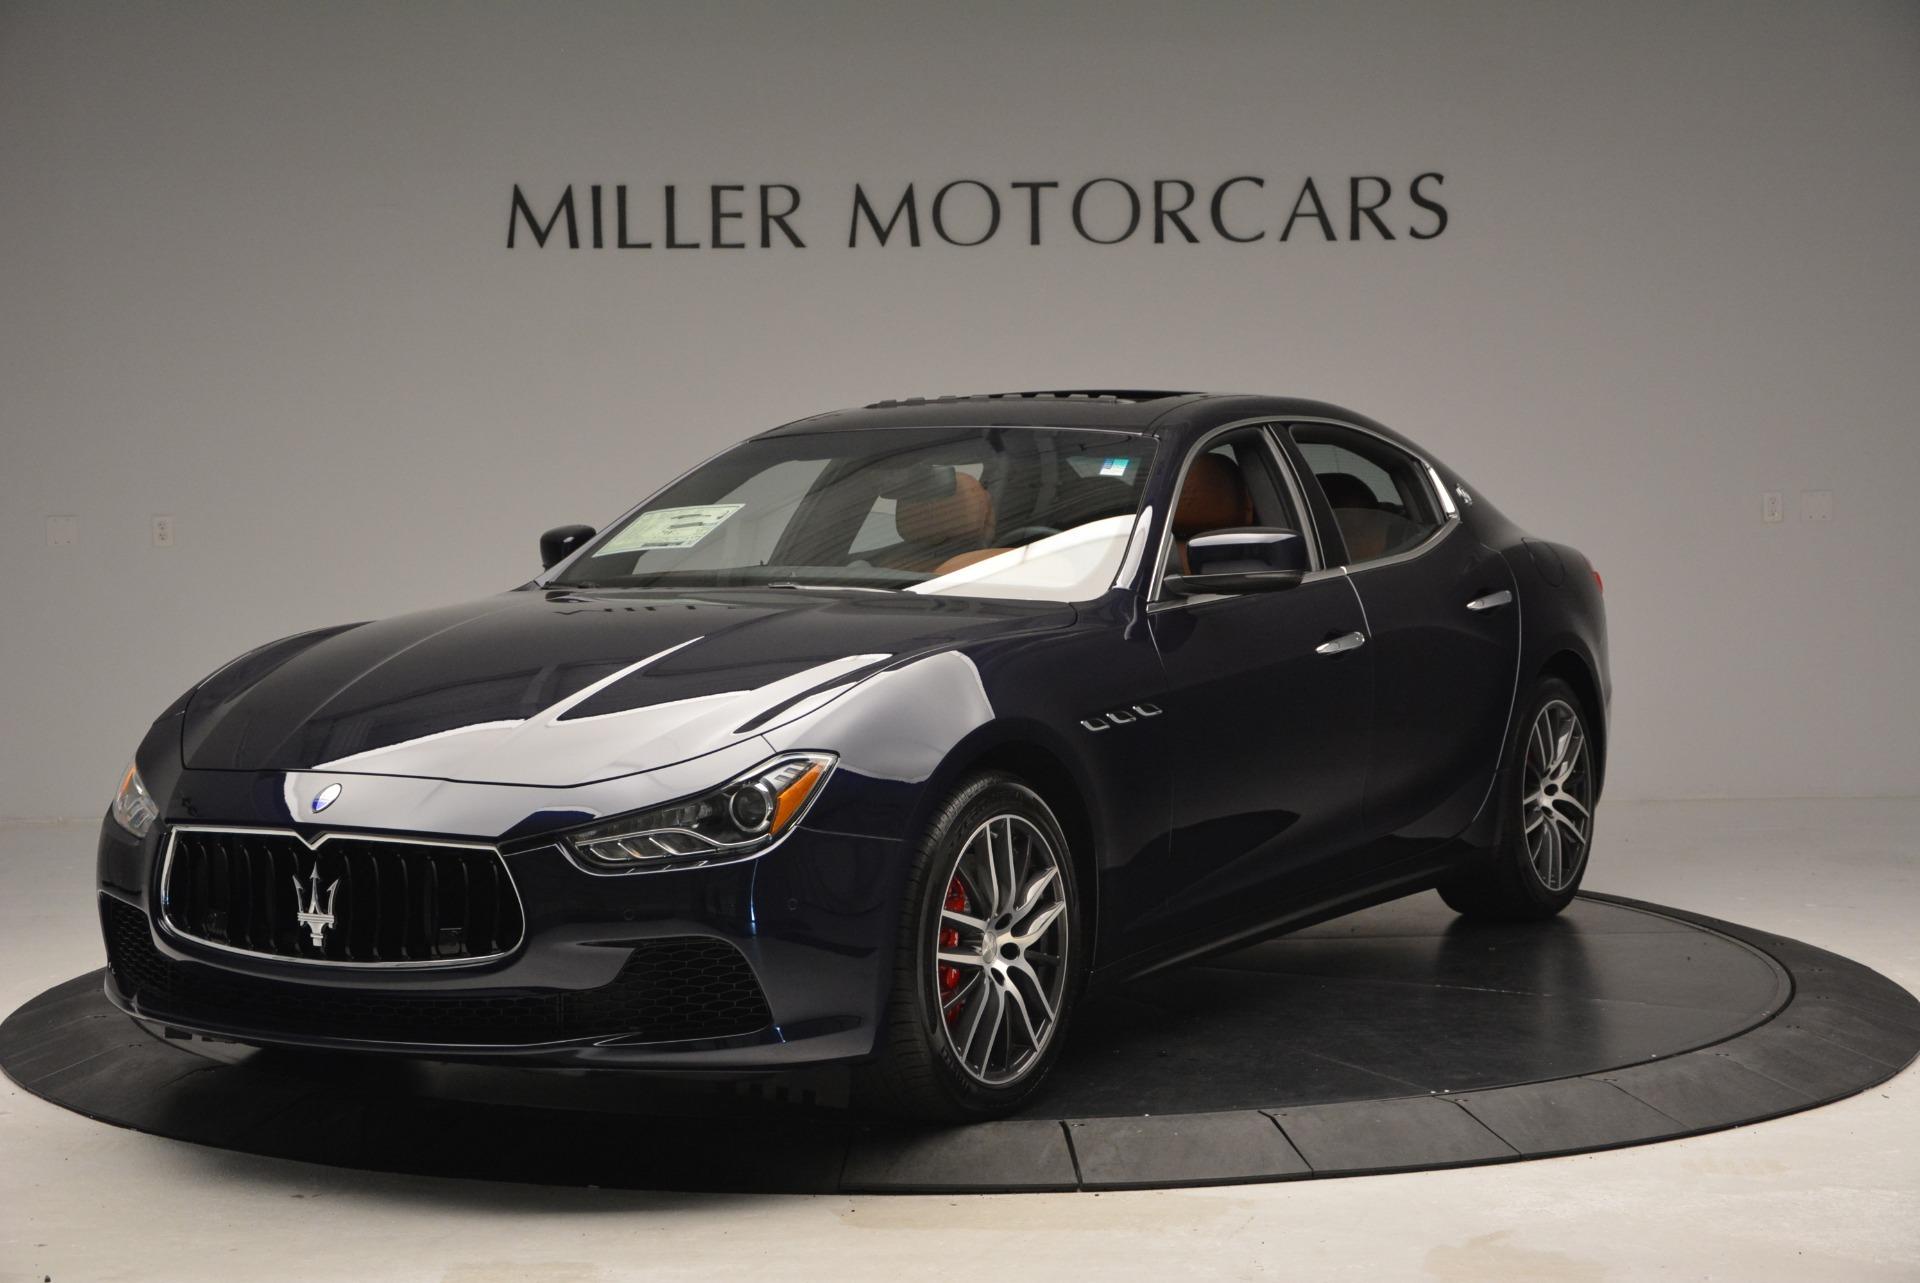 New 2017 Maserati Ghibli S Q4 For Sale In Greenwich, CT 766_main